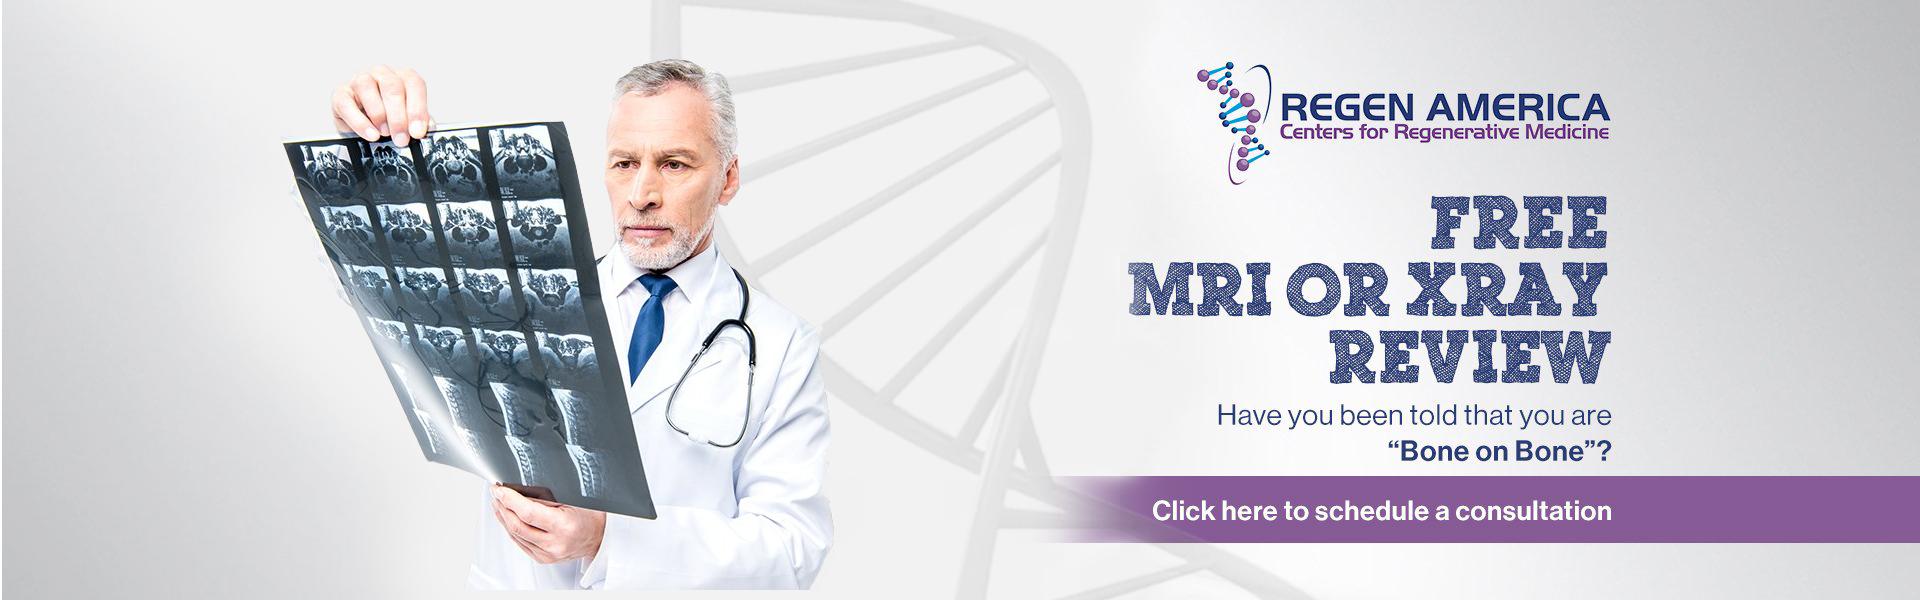 Free MRI – Xray Review